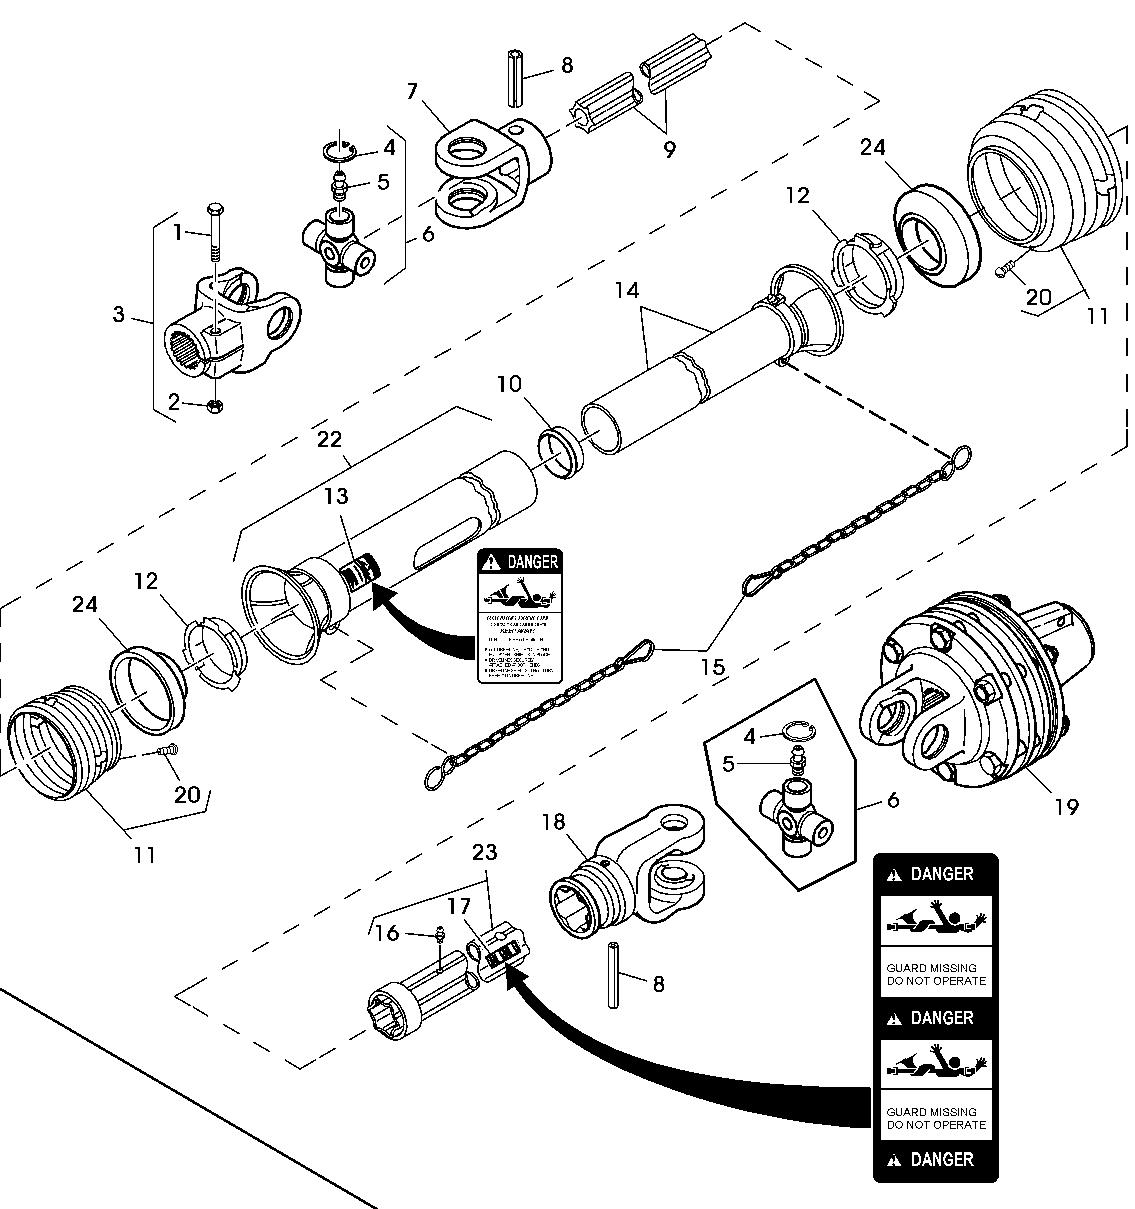 Hesston Parts Service